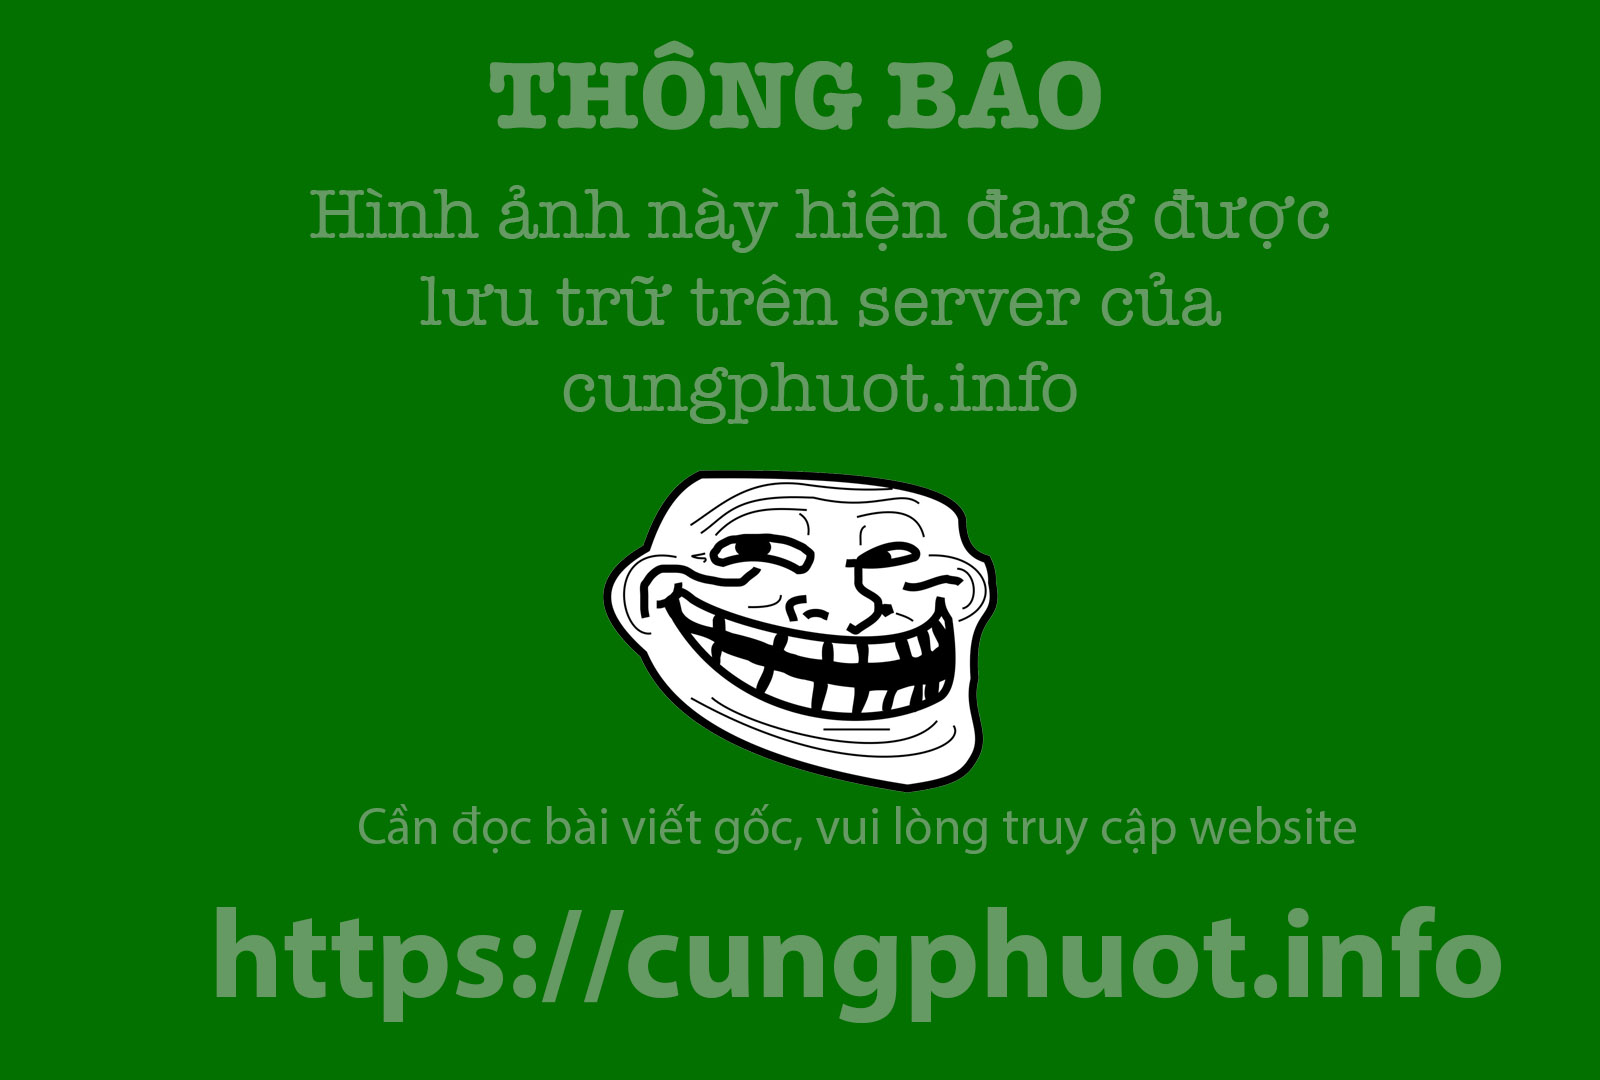 Dan phuot me man ve dep ky vi cua hang Prai o Quang Tri hinh anh 2